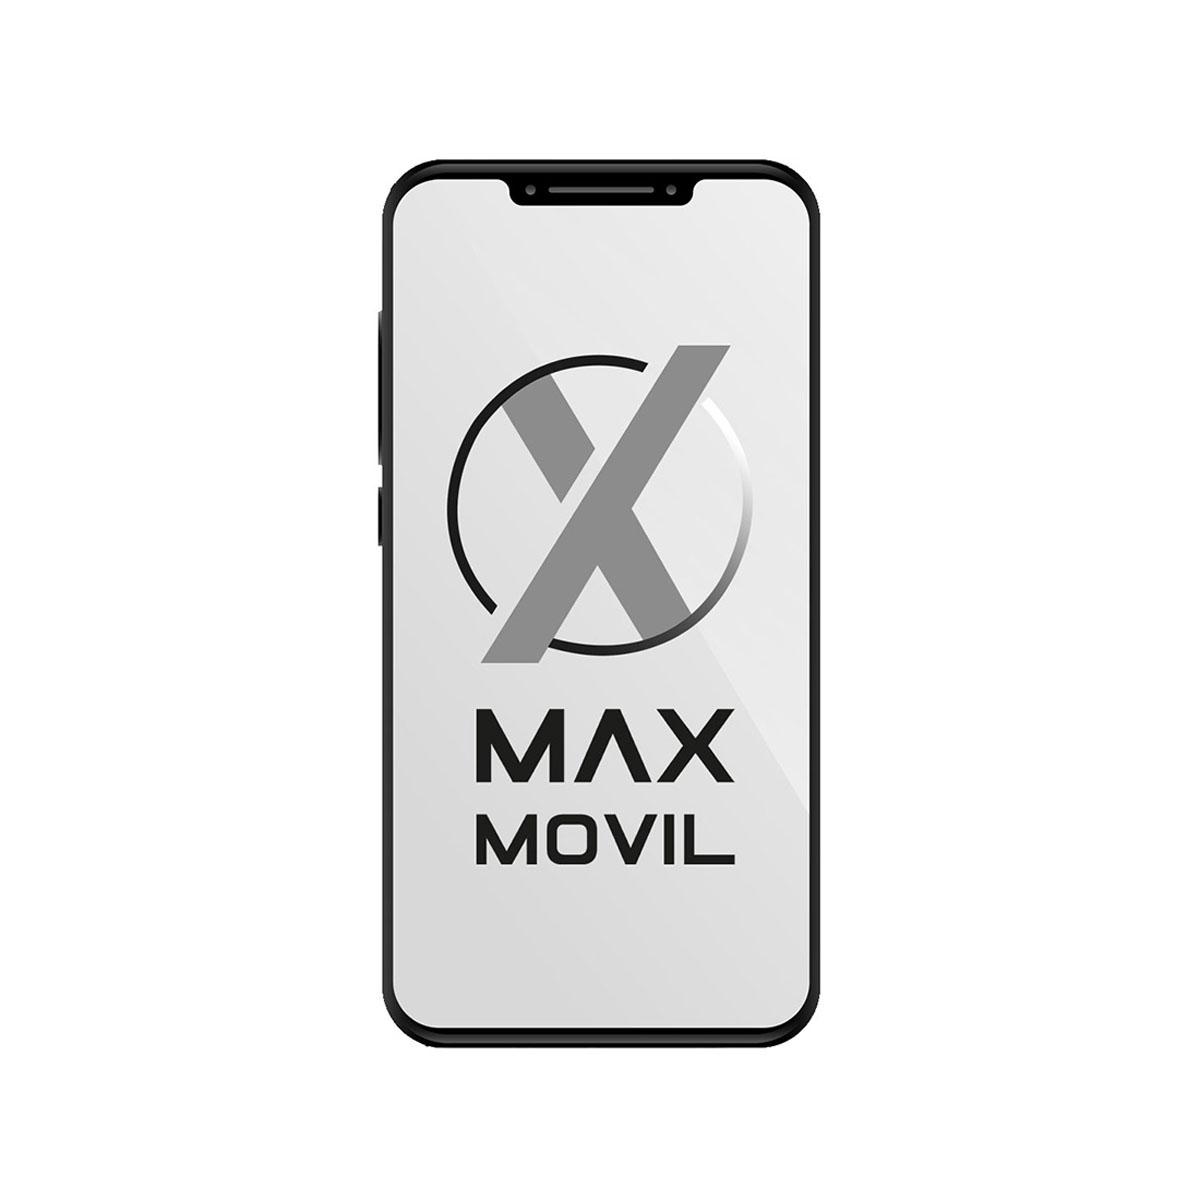 Modulo multimedia HDMI Keystone  Keynet 45x22,5 blanco, conexión H/H.